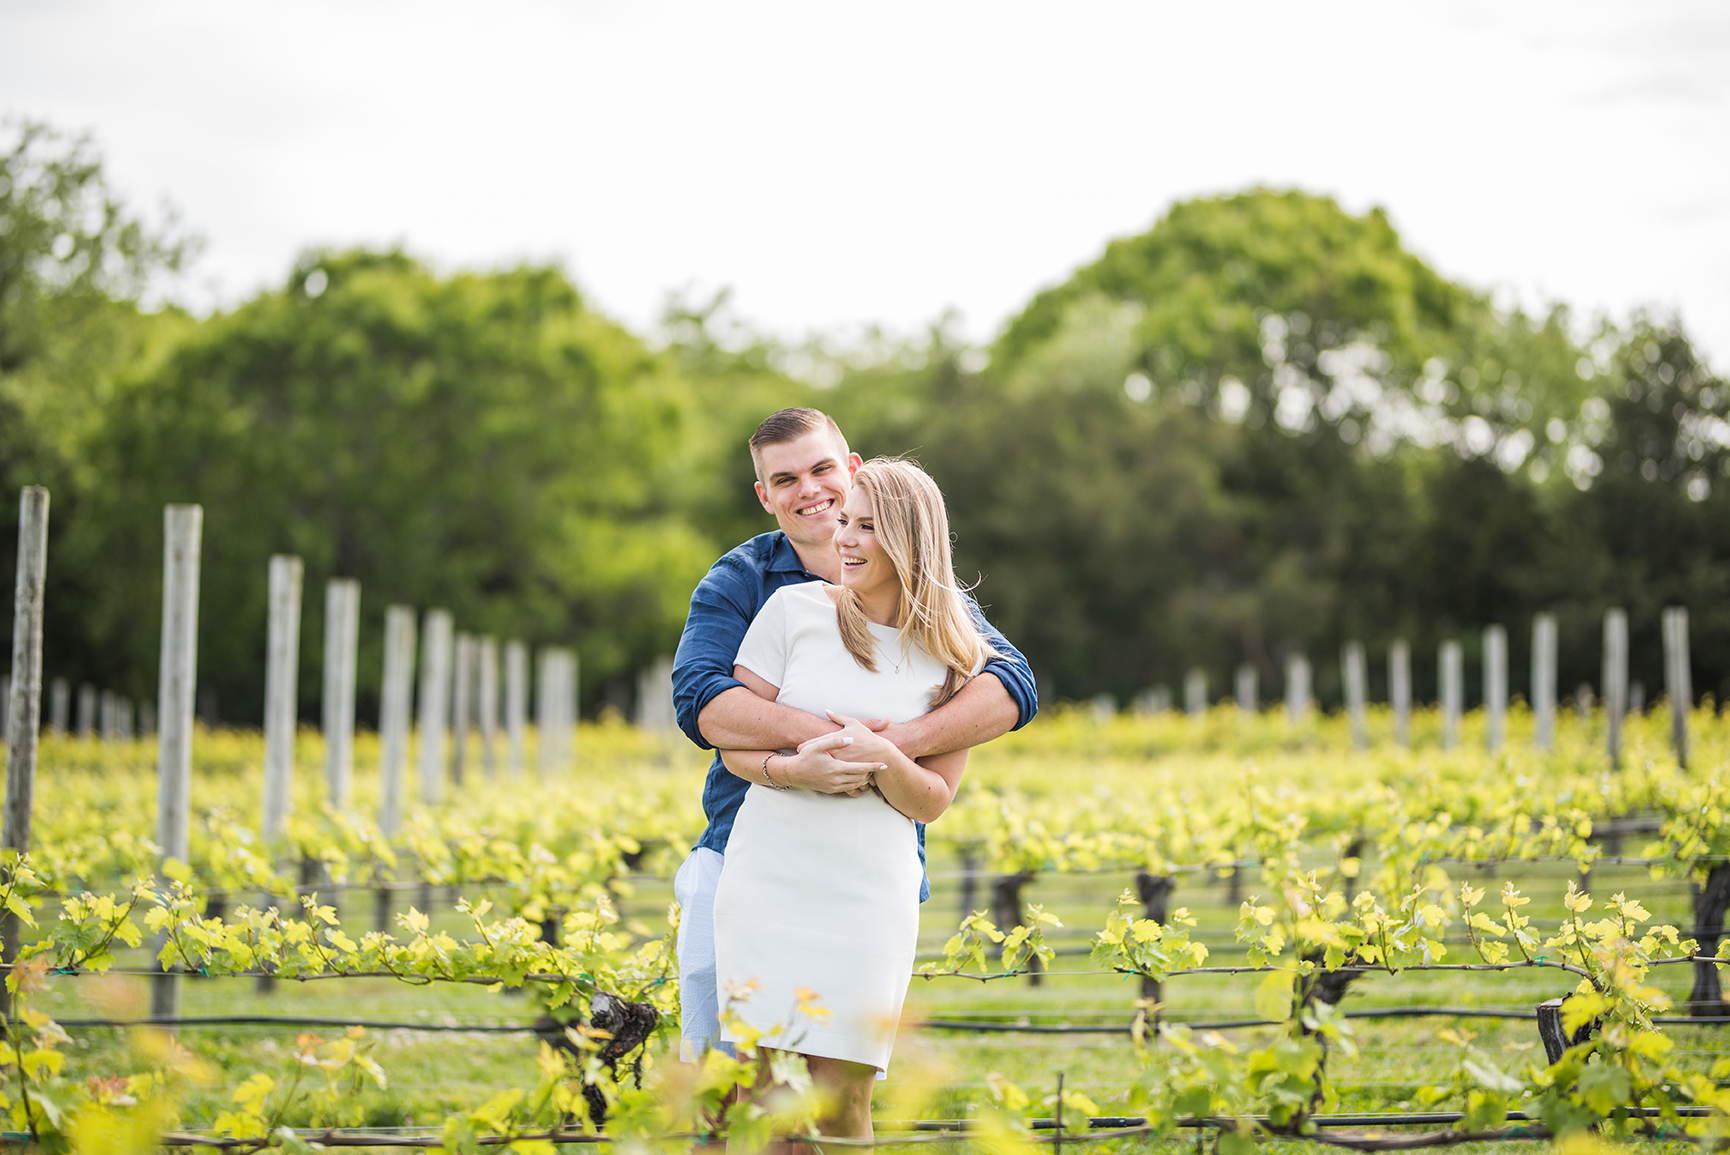 Jenn + Mike's Winery Engagement at Pellegrini Vineyards